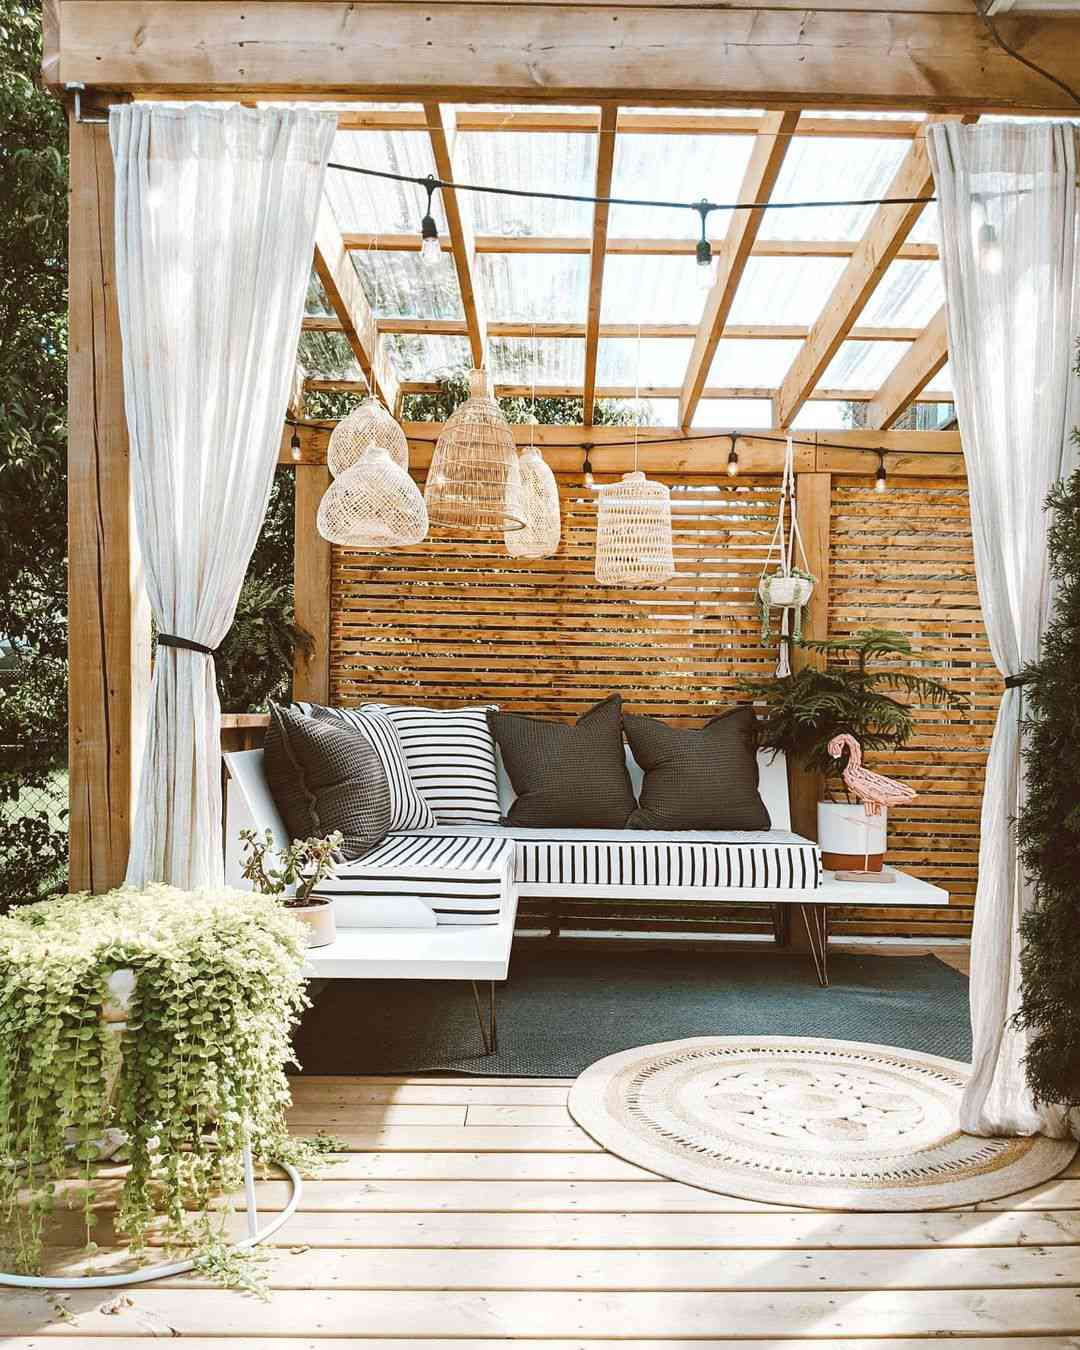 Outdoor patio with boho lanterns